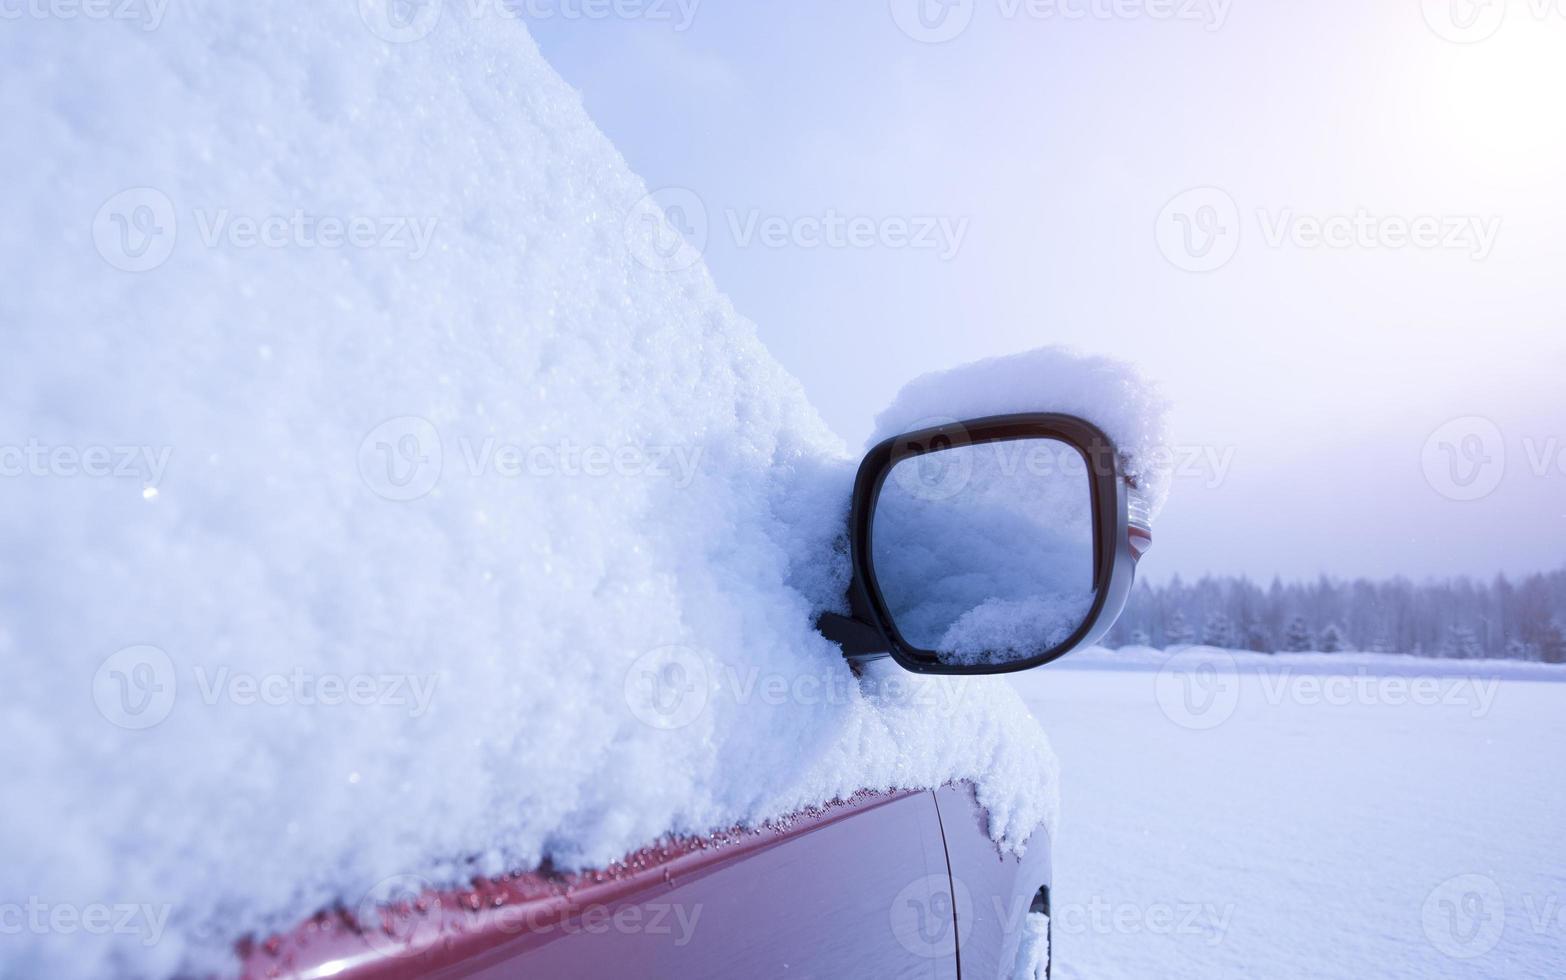 auto vallende sneeuw foto